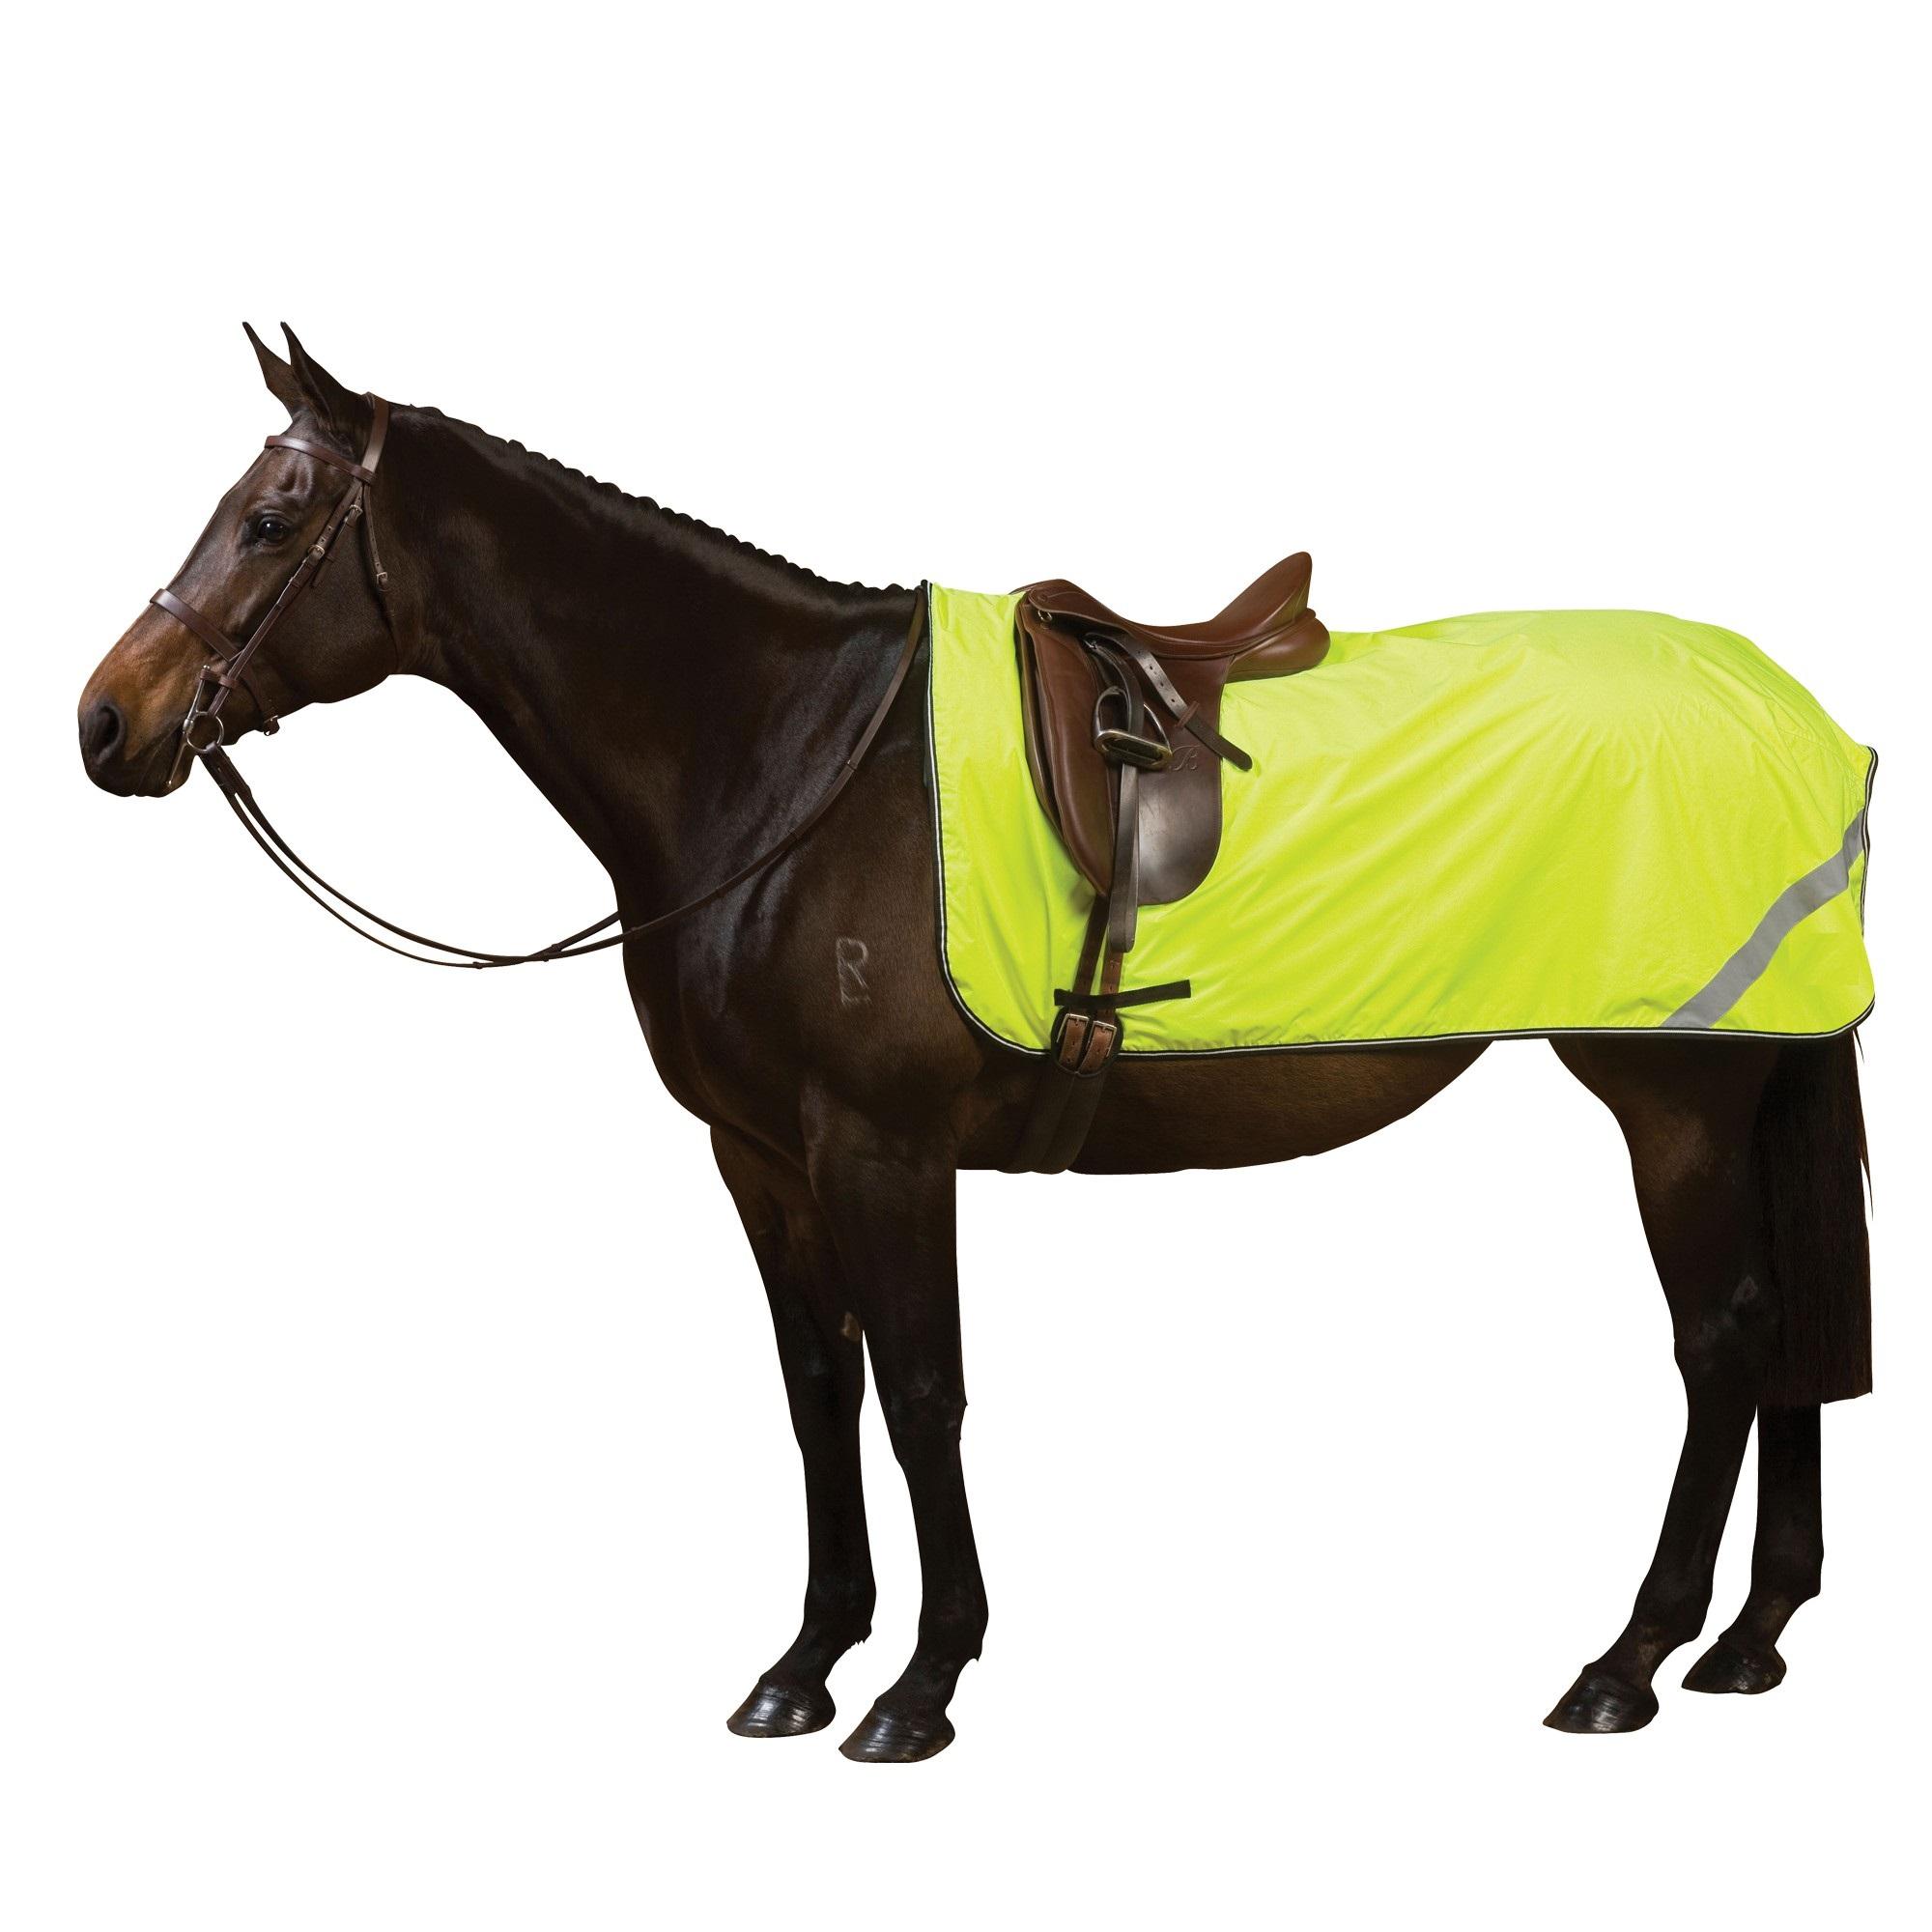 Horse Equipment UK | Equestrian Equipment | Horse Riding ... Saddler